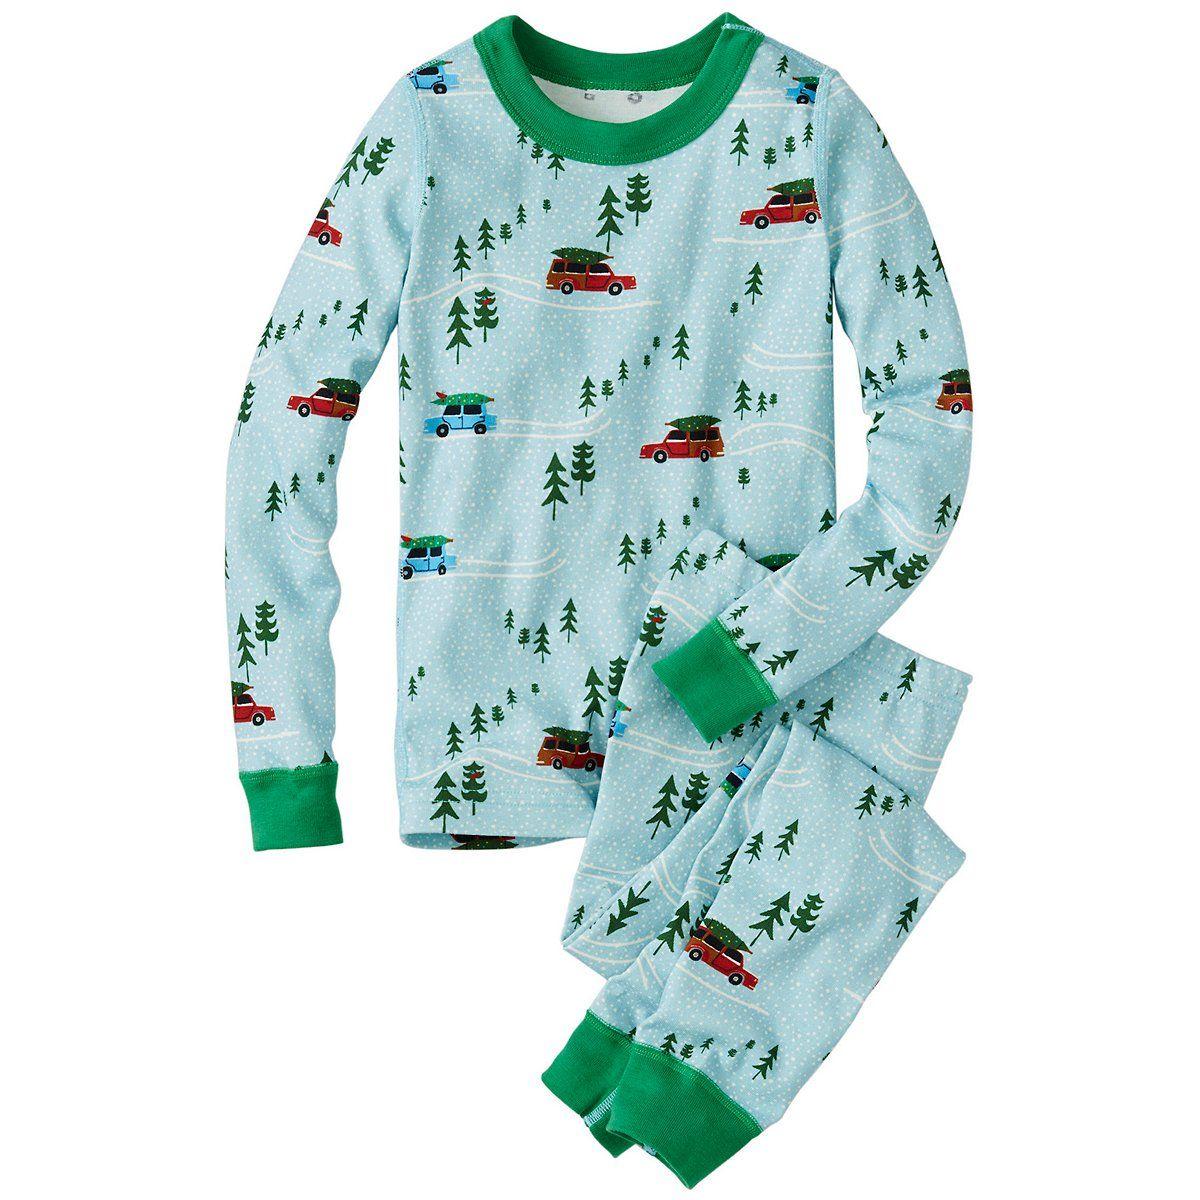 Kids Long John Pajamas In Organic Cotton by Hanna